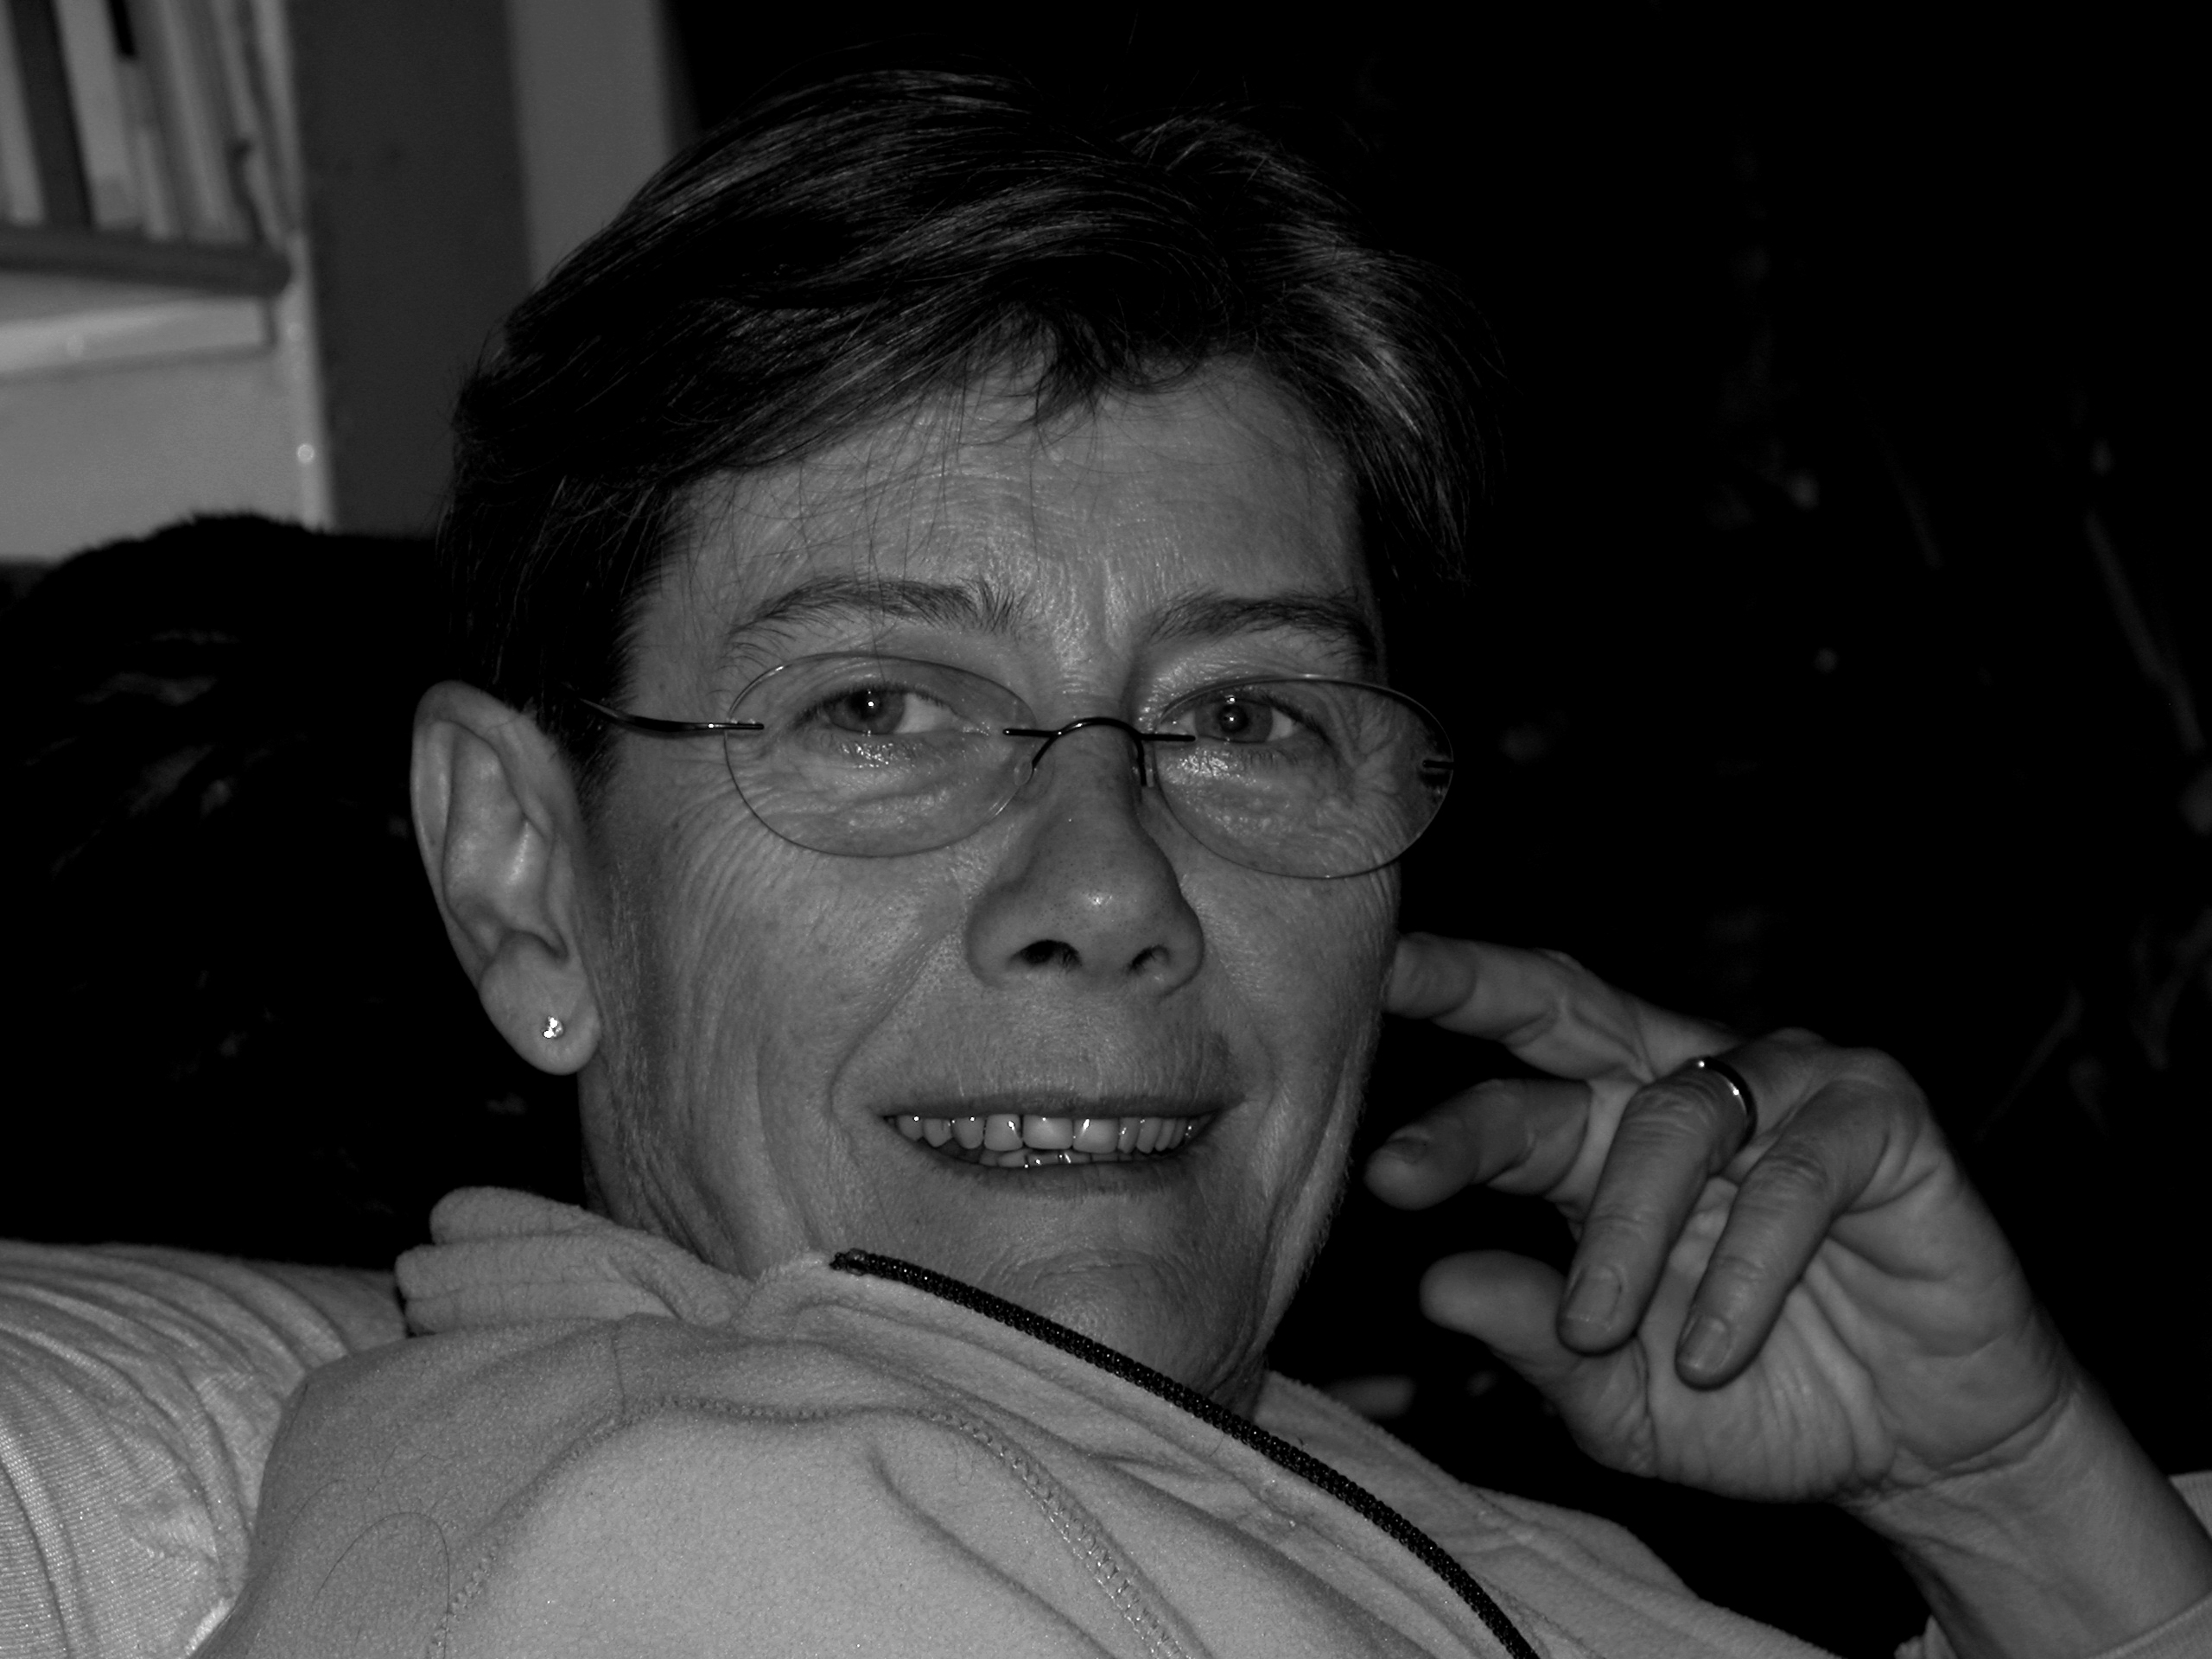 Jackie Bouthillier-Marillaud